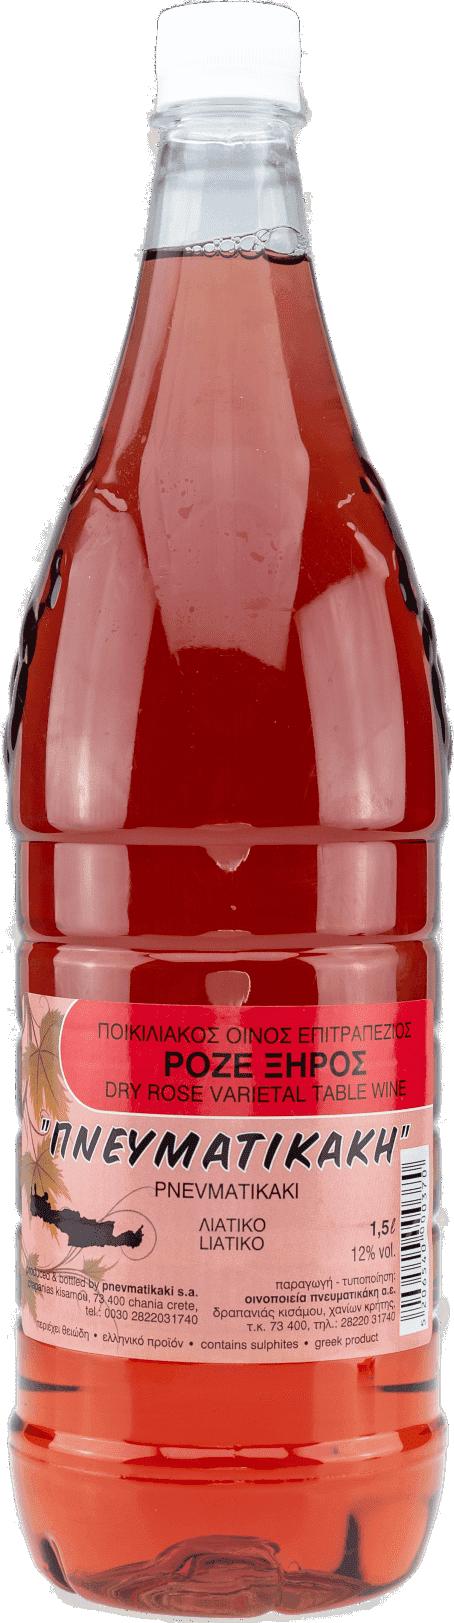 pneym-bottle-45 (1)